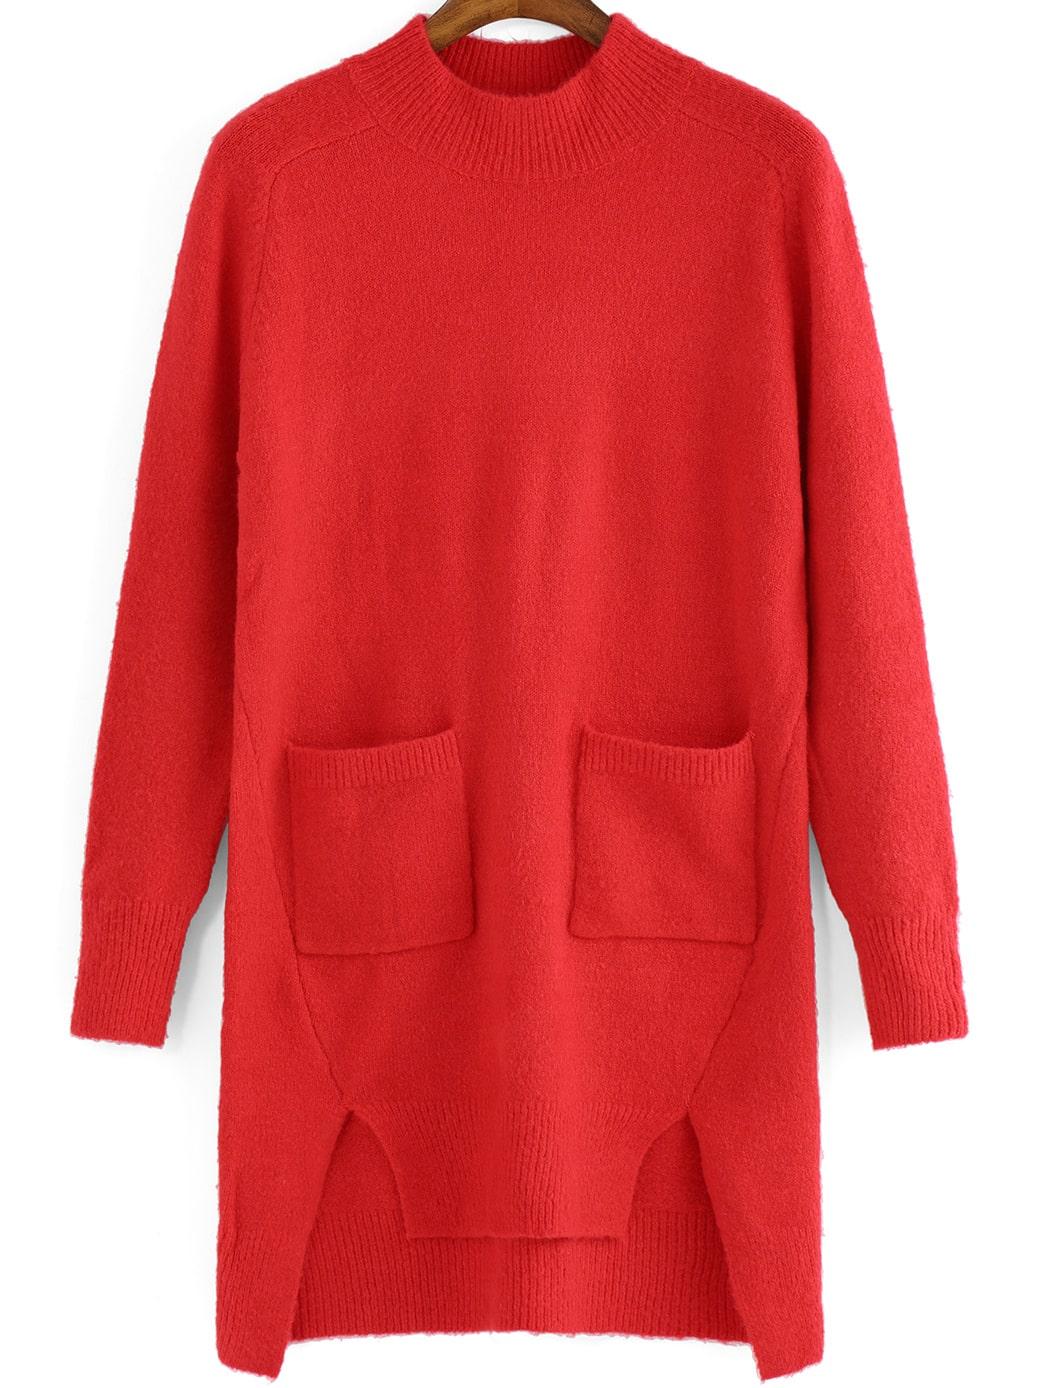 Red Crew Neck Pockets High Low Sweater Dress -SheIn(Sheinside)